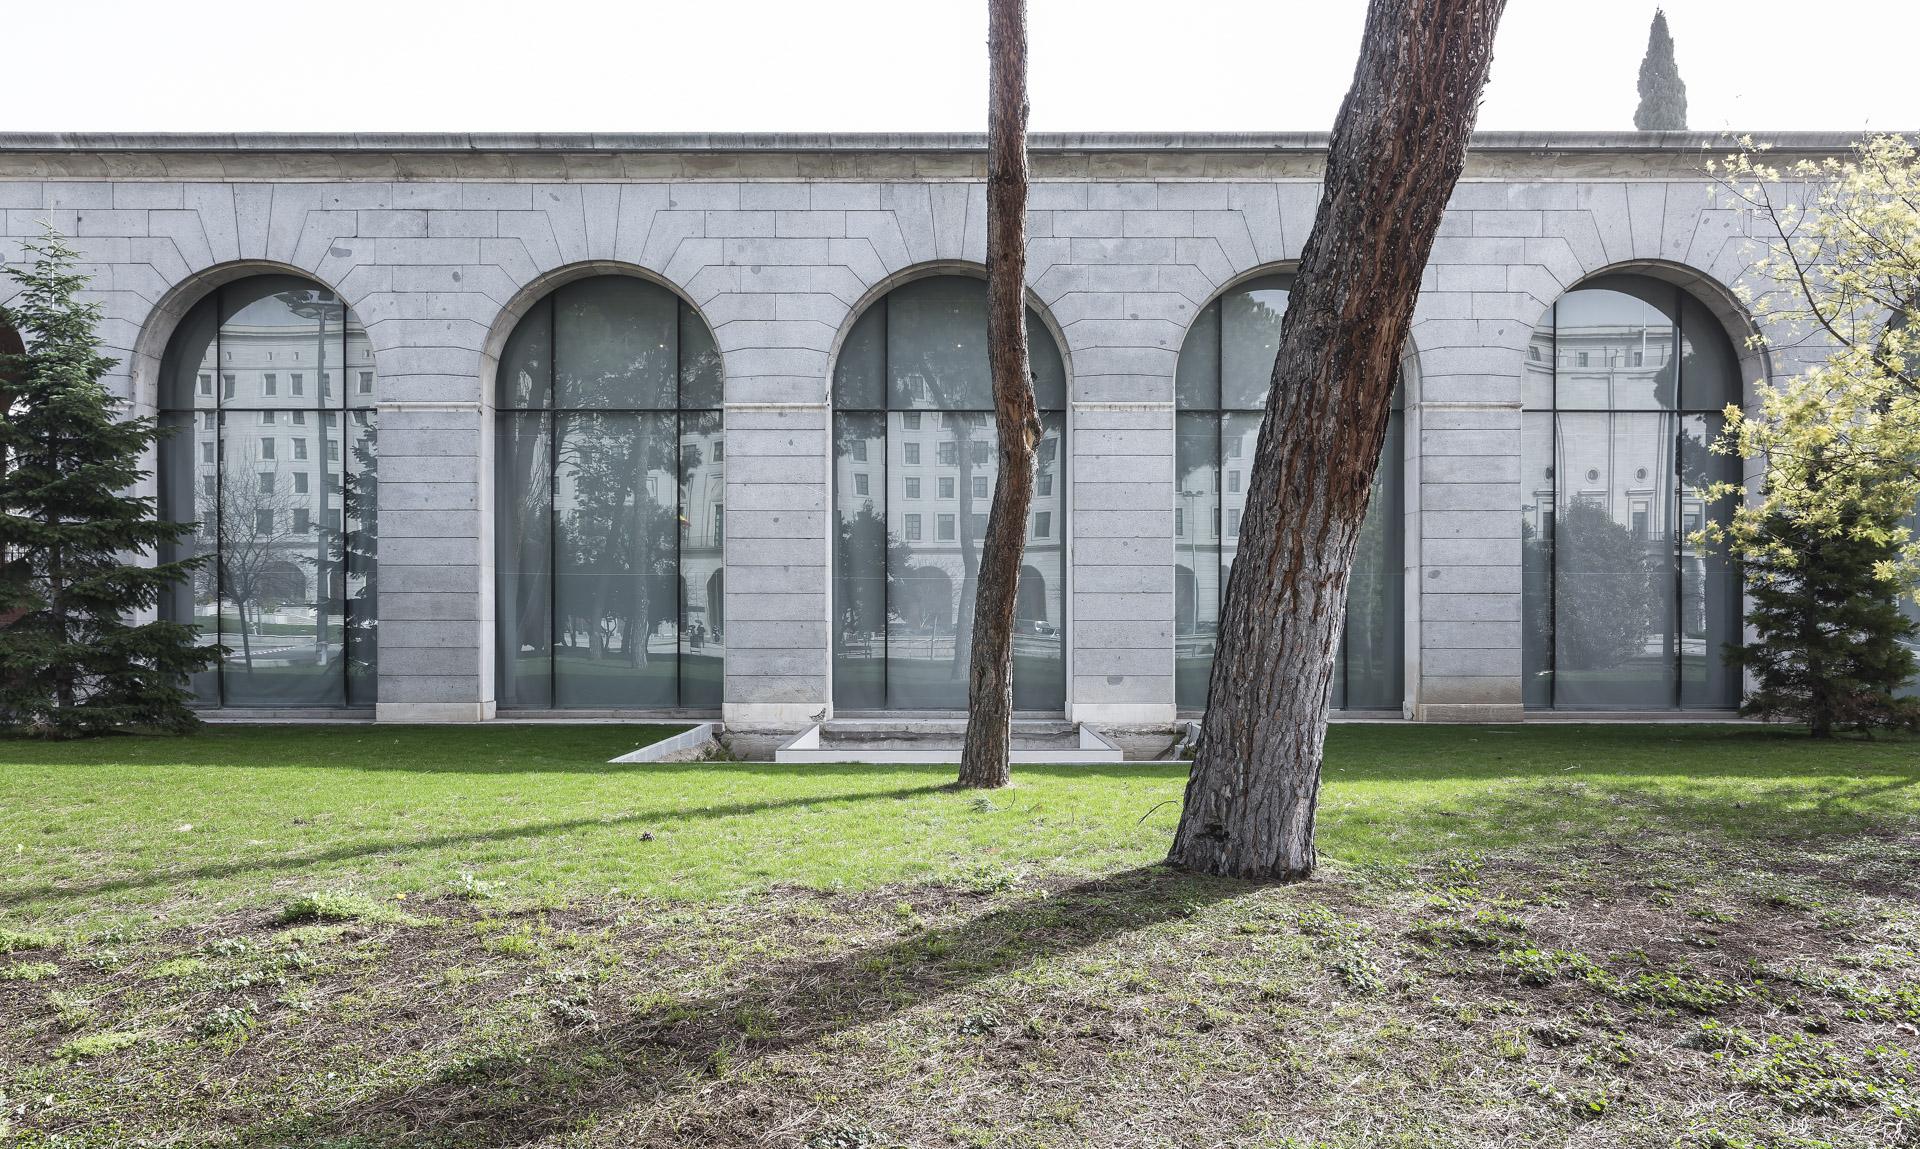 fotografia-arquitectura-madrid-nuevos-ministerios-elorza-german-cabo-01